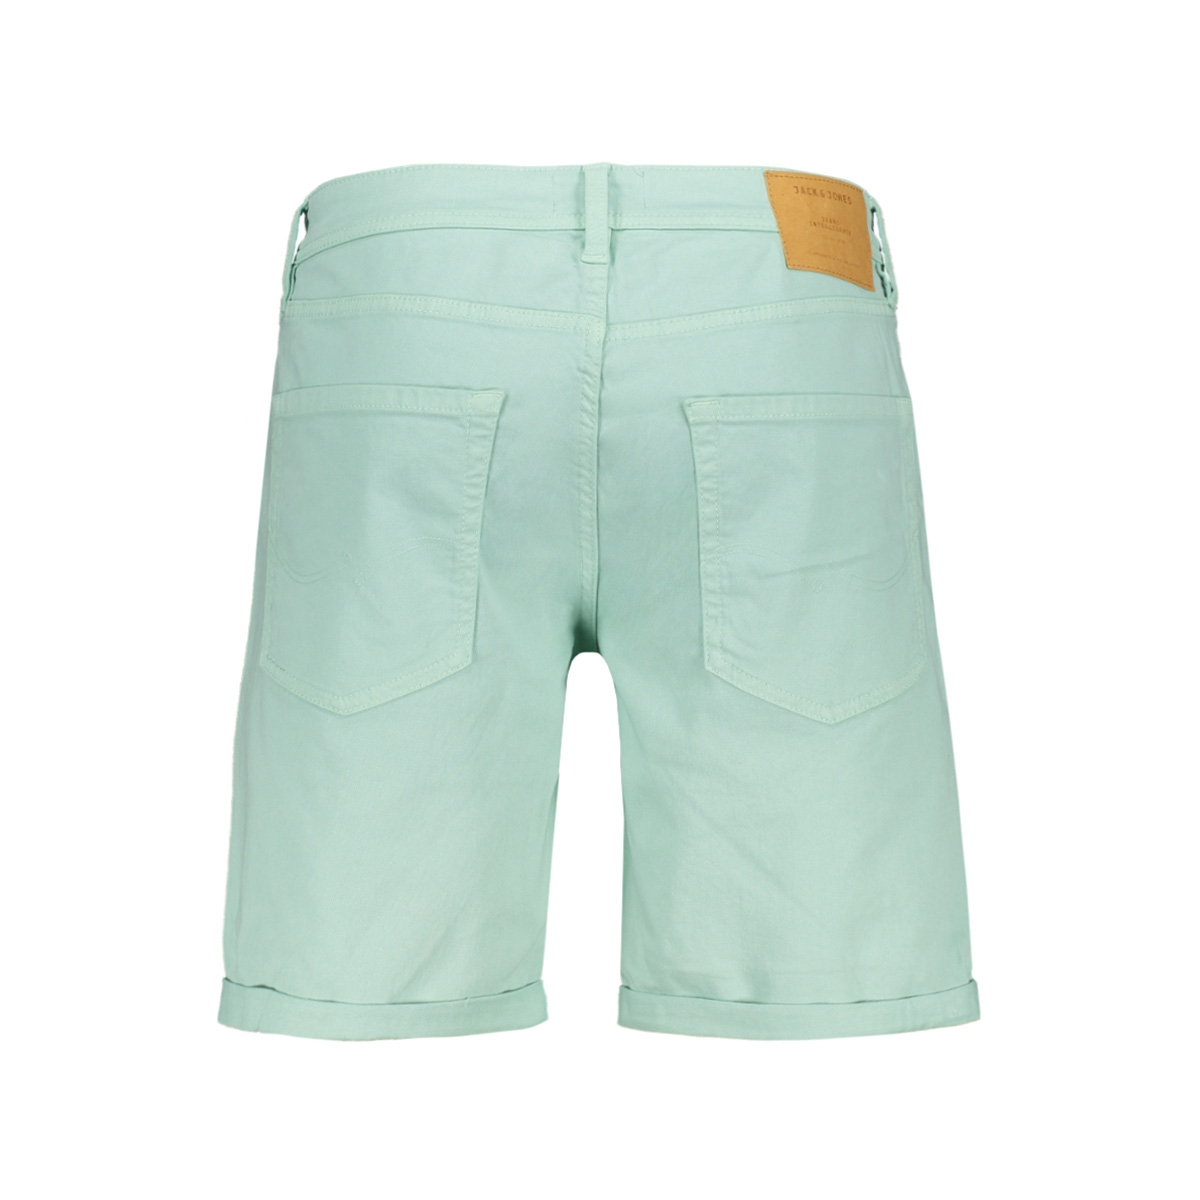 jjirick jjoriginal shorts akm 655 12150749 jack & jones korte broek lichen